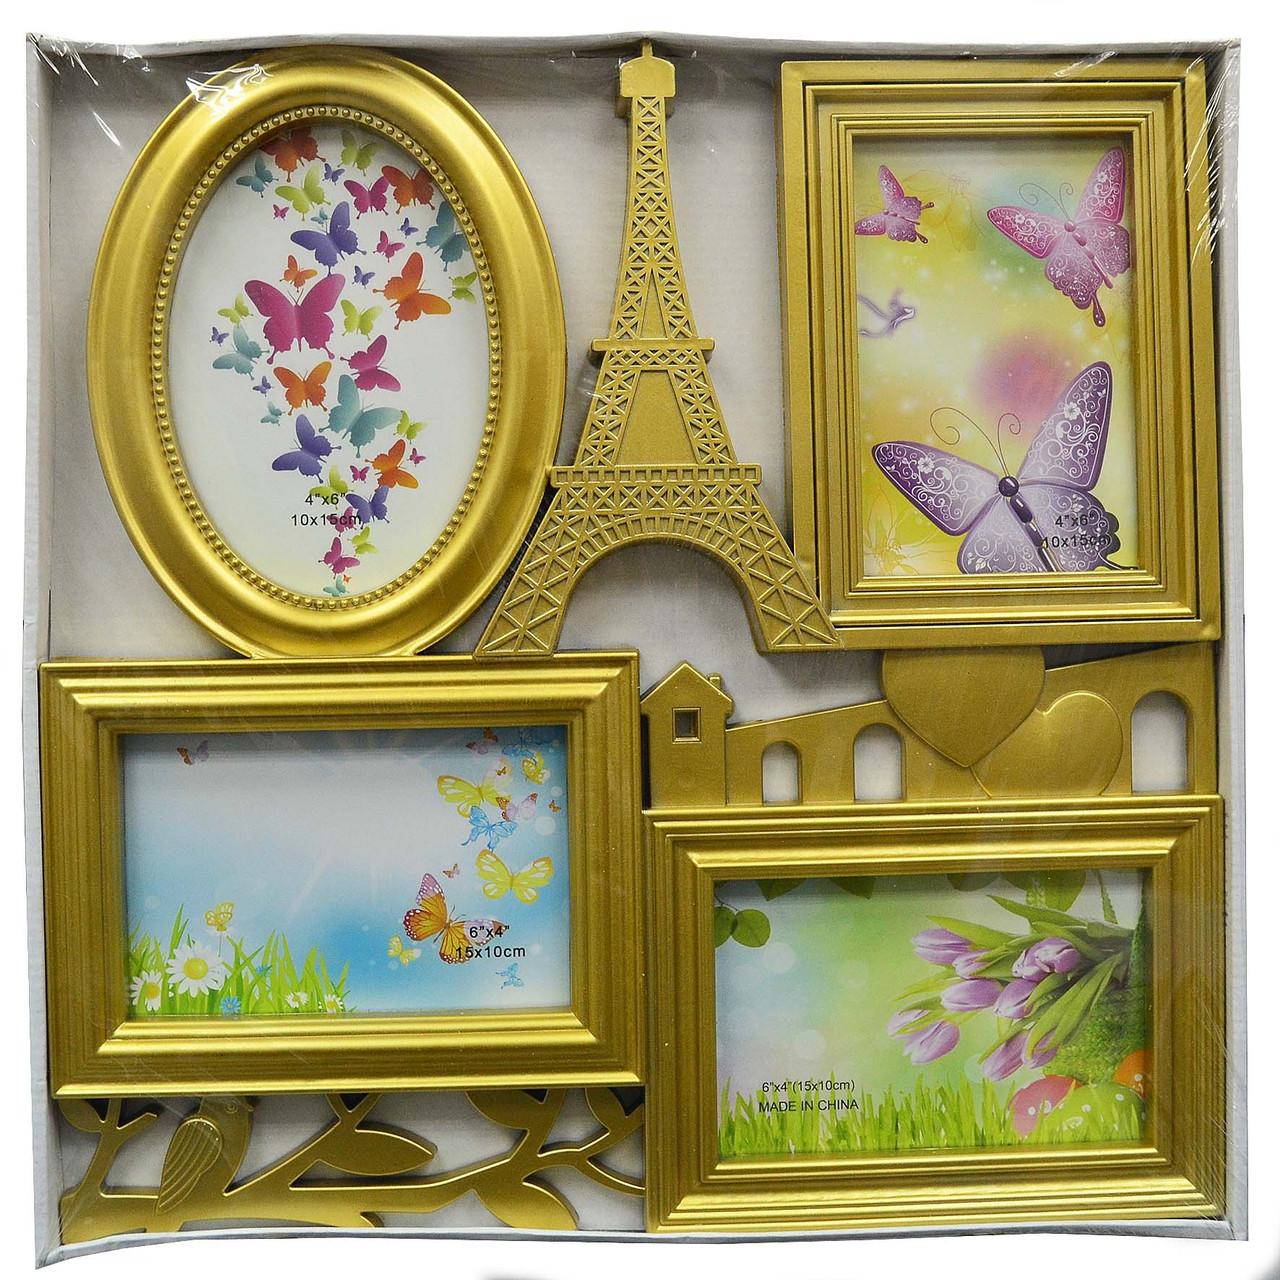 "Мультирамка ""PARIS"" — Фоторамка коллаж на стену"